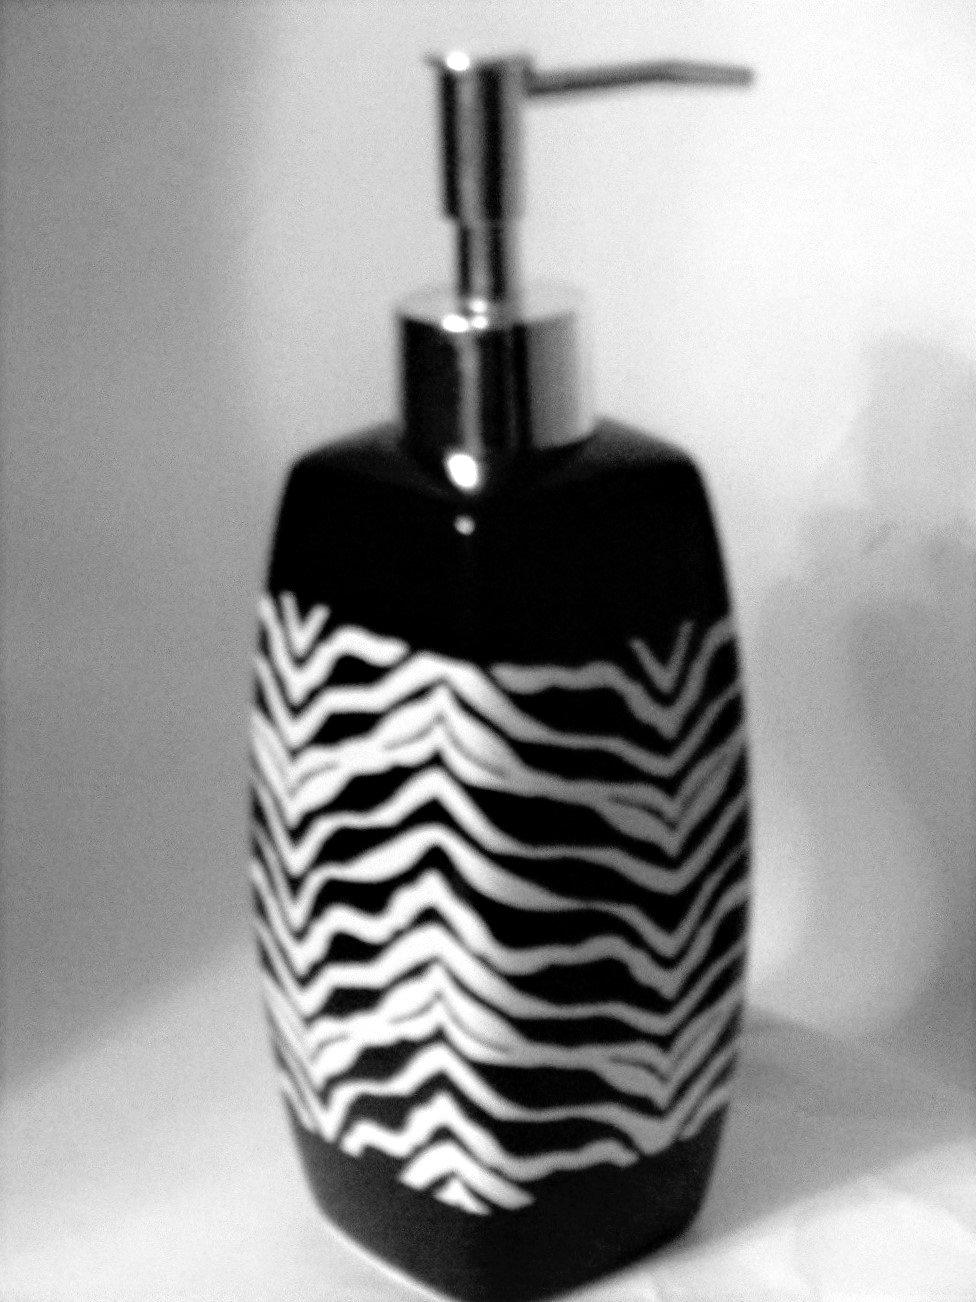 Zebra Stripe Lotion Pump Soap Dispenser Popular Bath